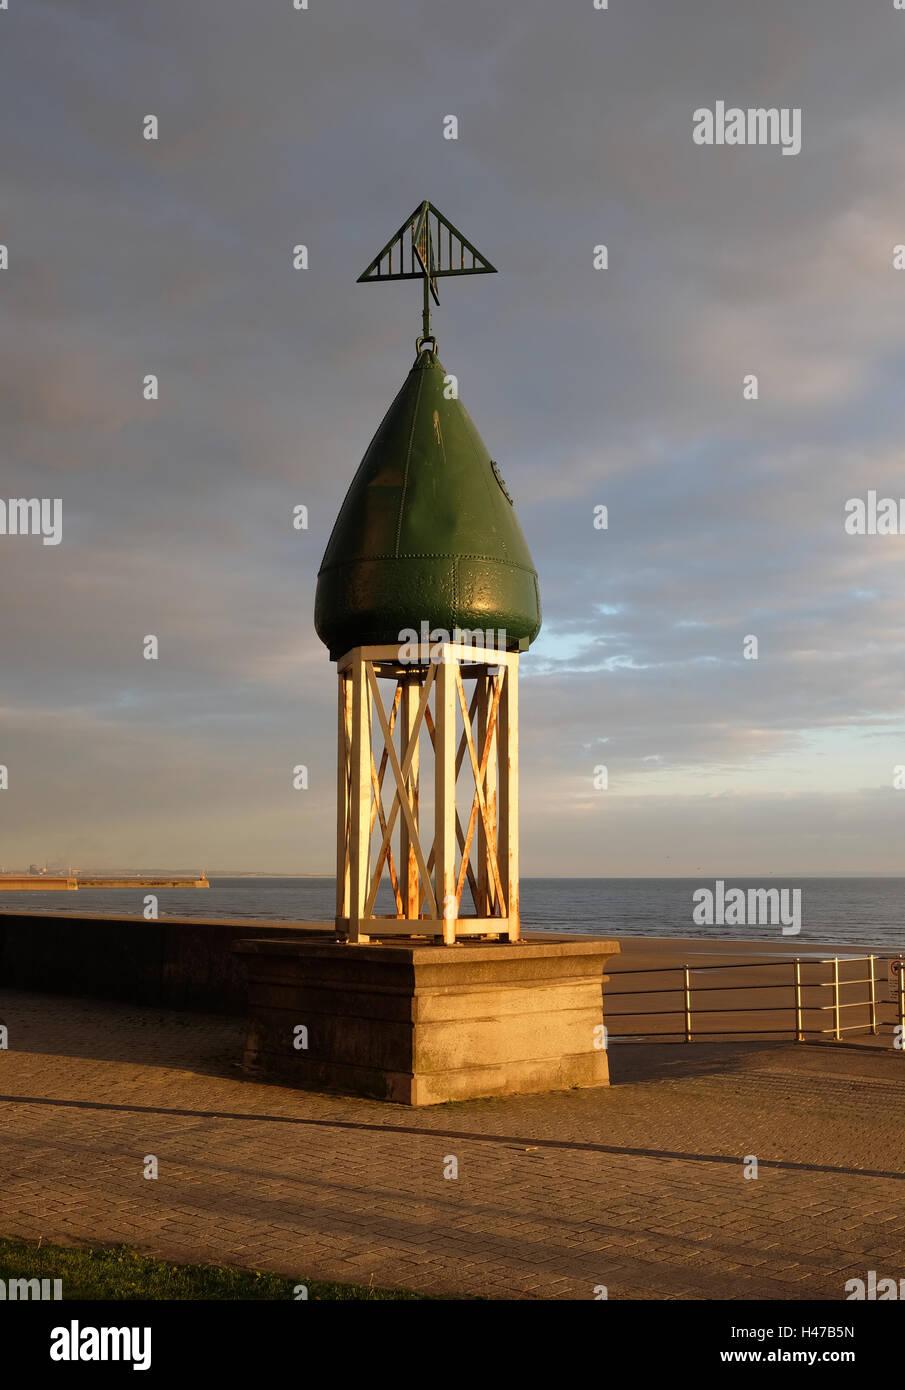 Navigation buoy sculpture, Marine Walk, Swansea - Stock Image